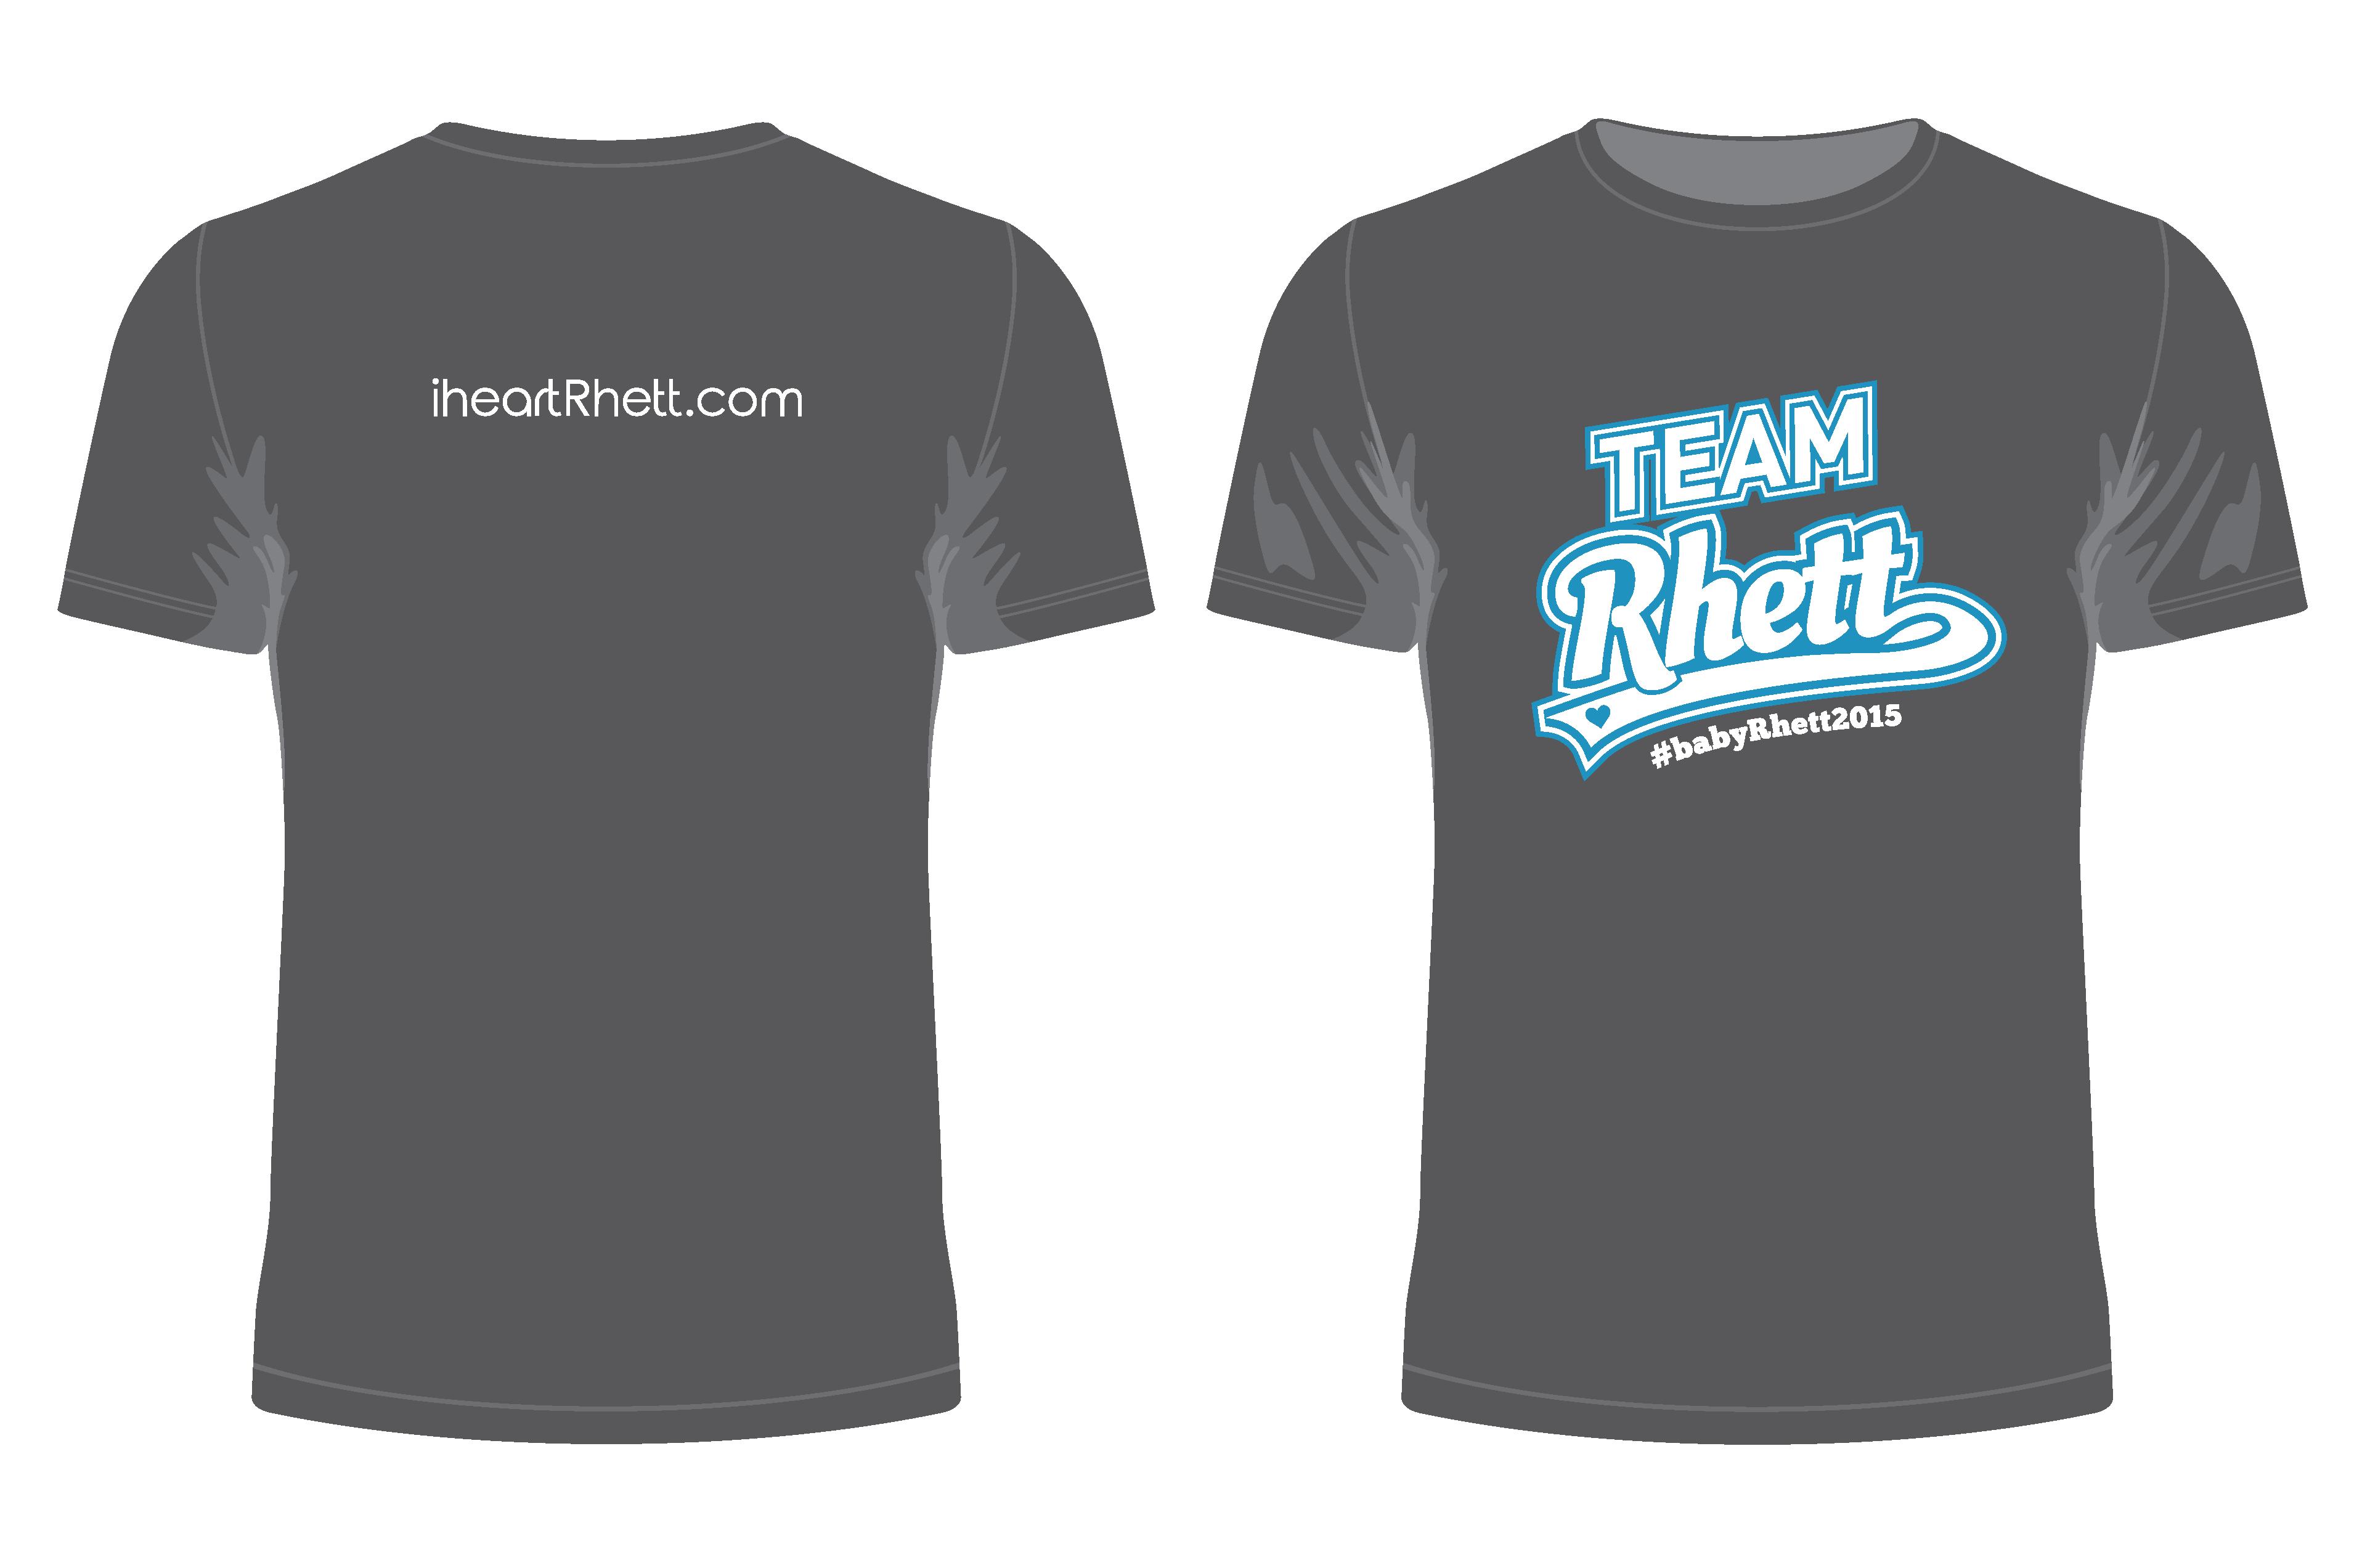 Team Rhett Shirt - Charcoal